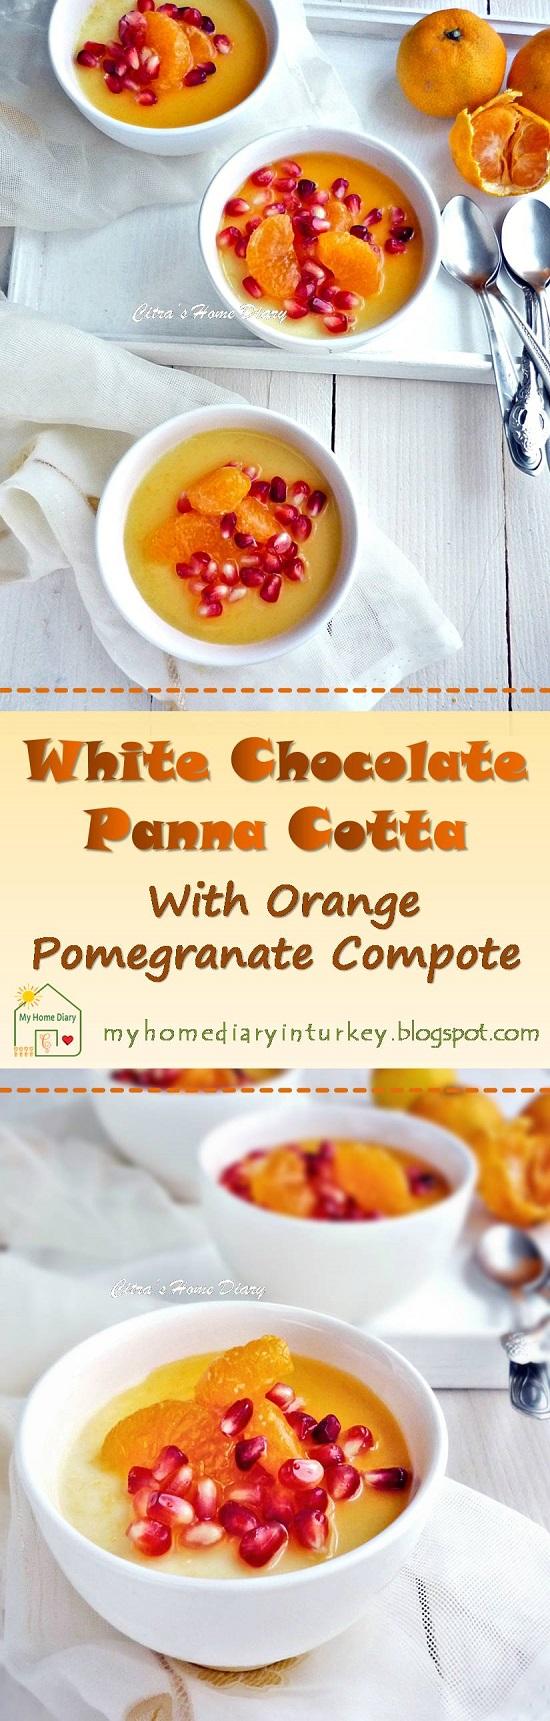 White Chocolate Panna Cotta with Orange Pomegranate Compote. | Çitra's Home Diary. #pannacottarecipe #whitechocolatedessert #orangecompote #pomegranate #orangerecipeidea #dessertidea